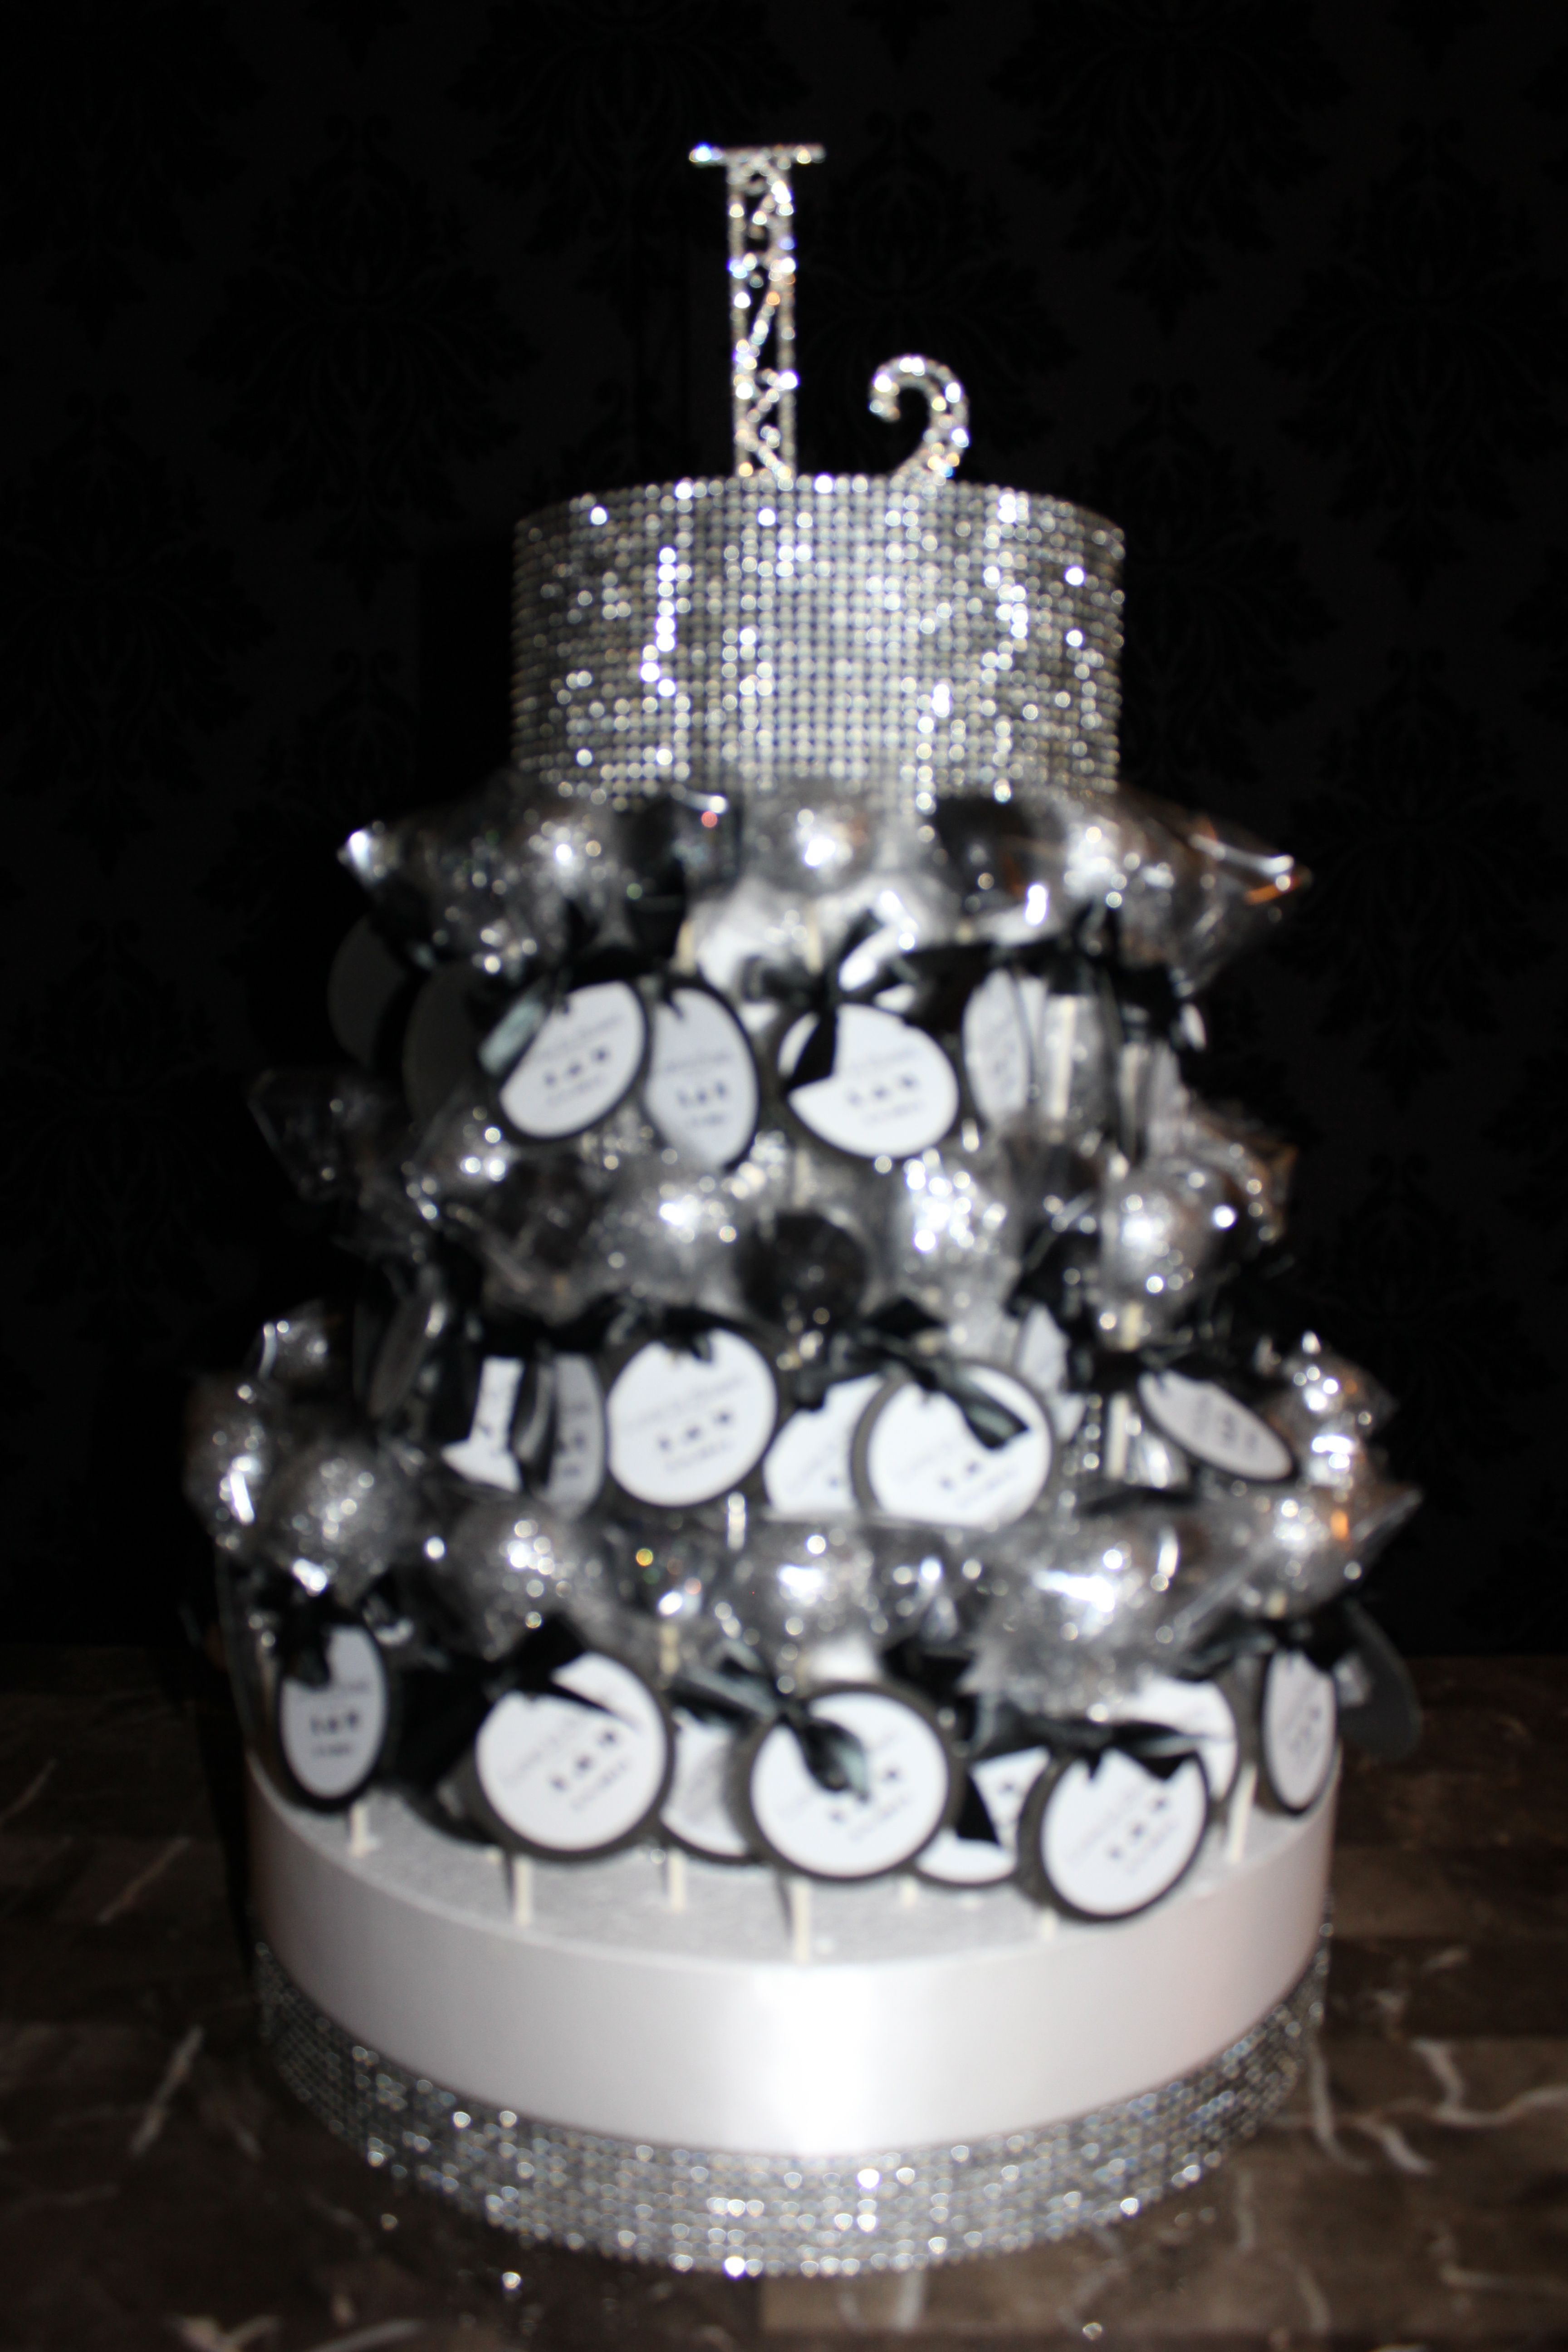 Black & Silver Cake Pops and Stand by RW Chocolate Fountain Rentals.  www.rwchocolatefountains.com